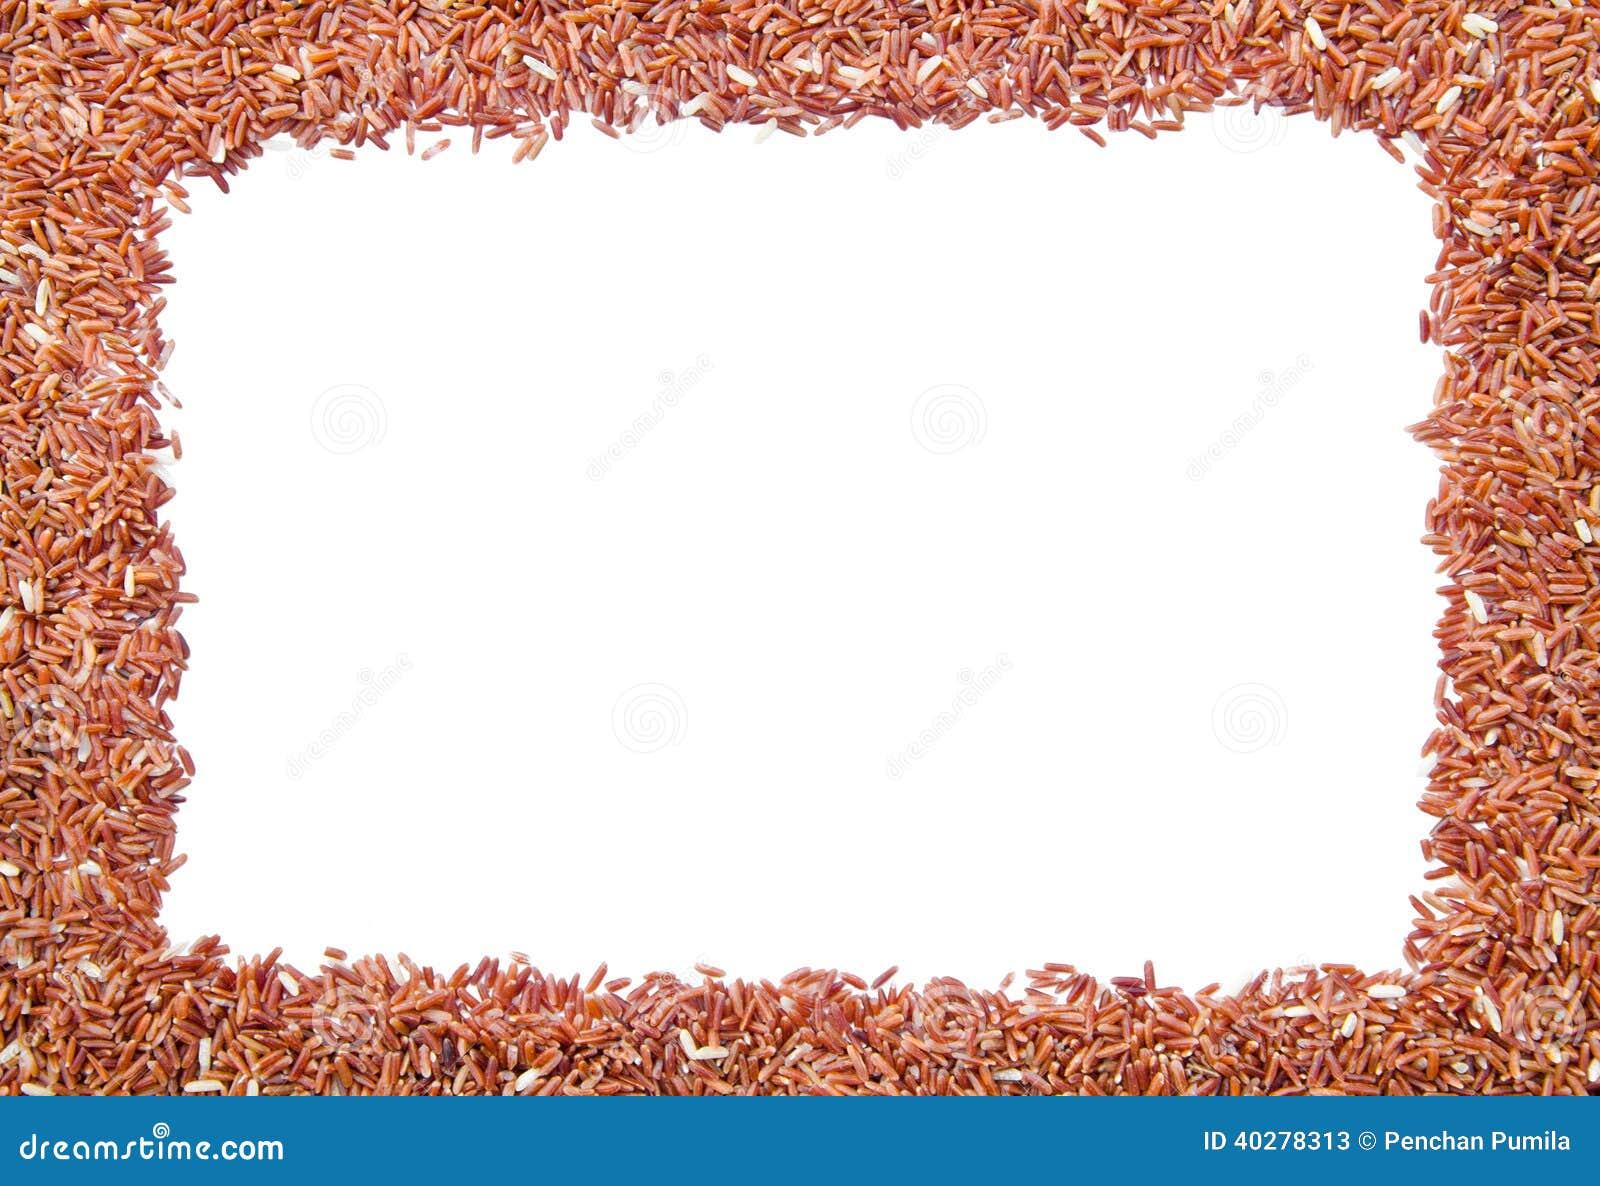 Рамка сырцового коричневого риса